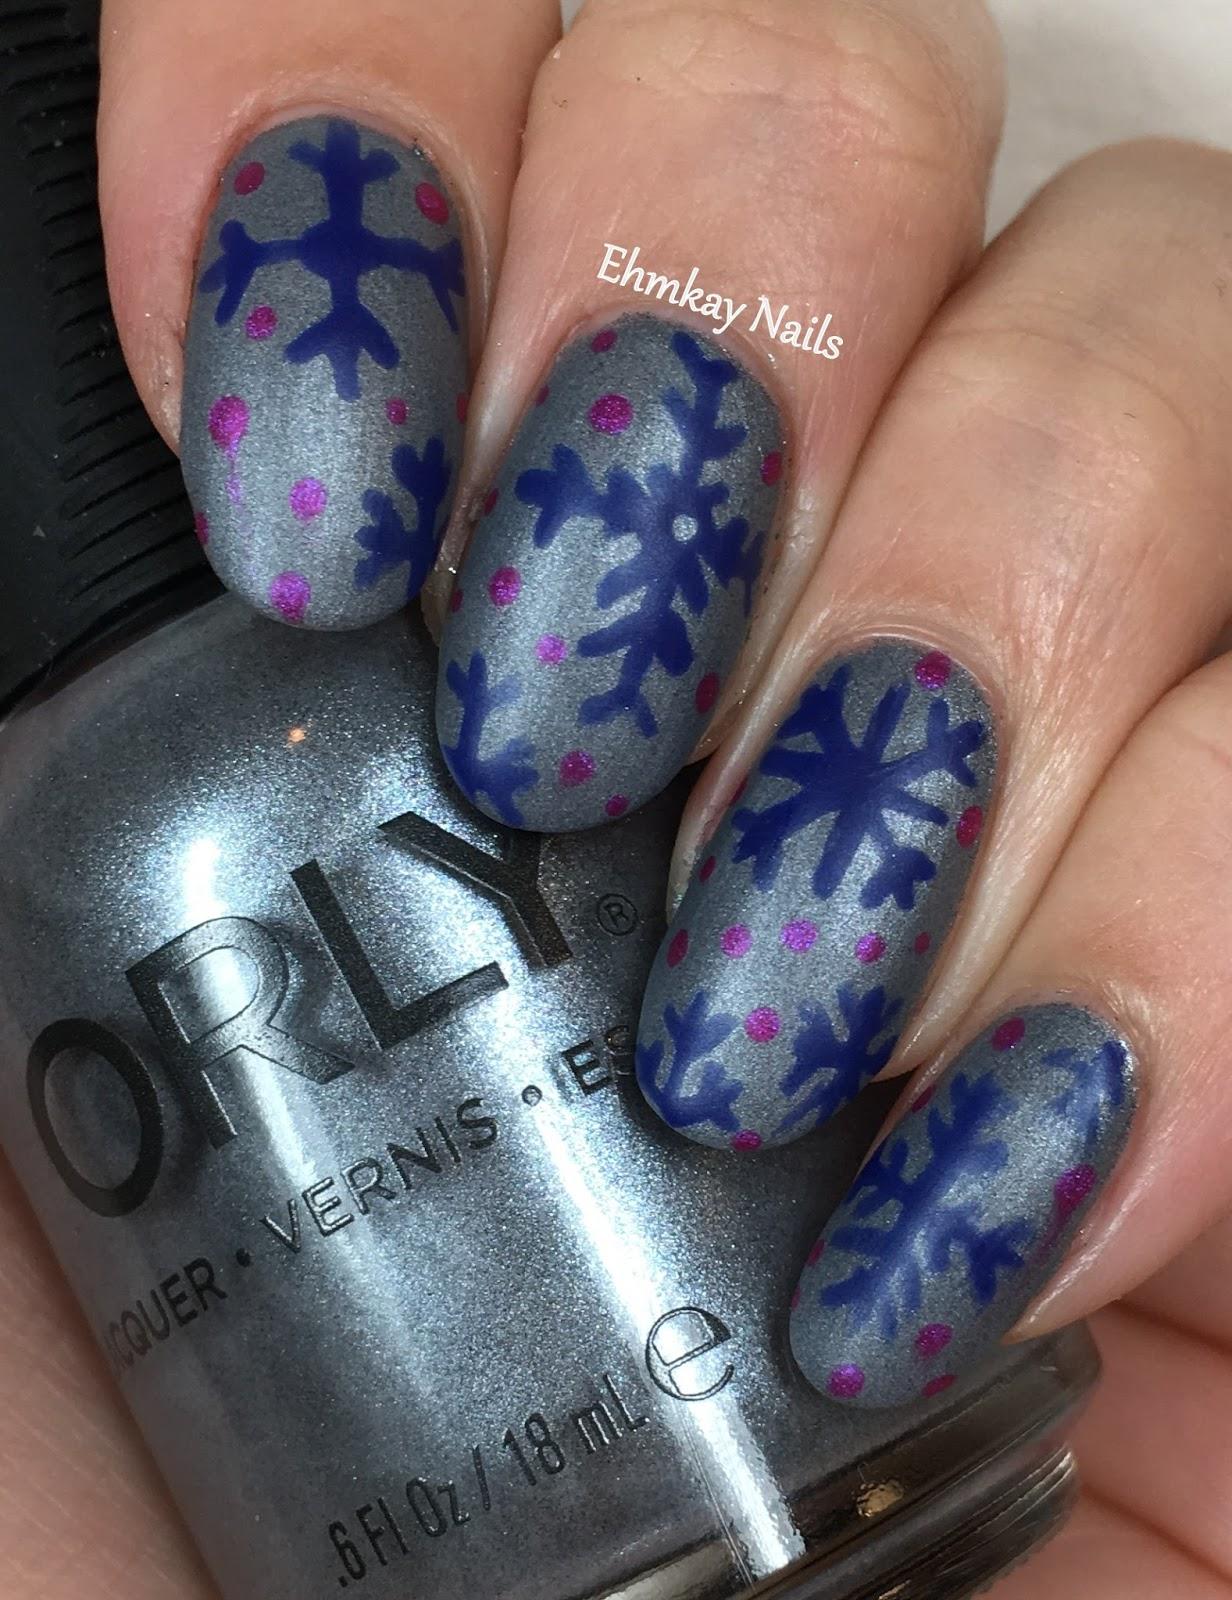 Ehmkay Nails New Year S Eve Nail Art With Kbshimmer Bling: Ehmkay Nails: Orly Sunset Strip Holiday 2016 Snowflakes